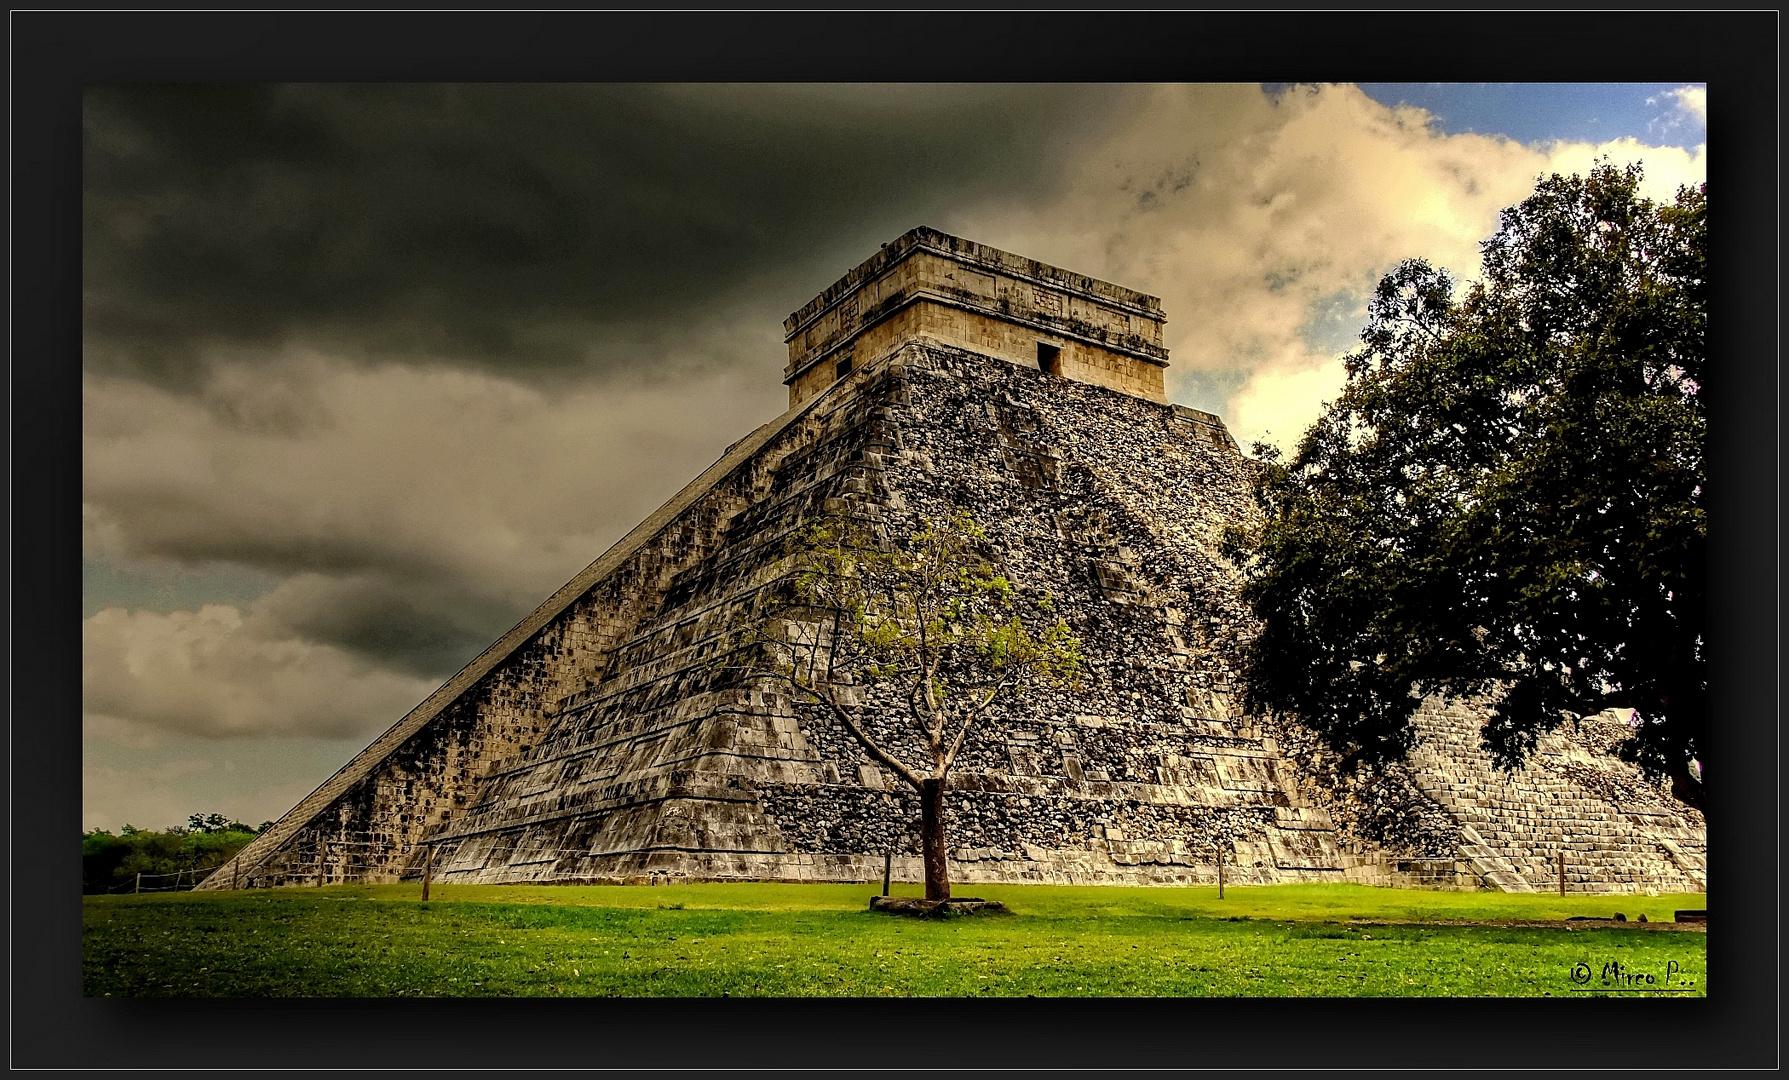 Mexico -Chichén Itzá